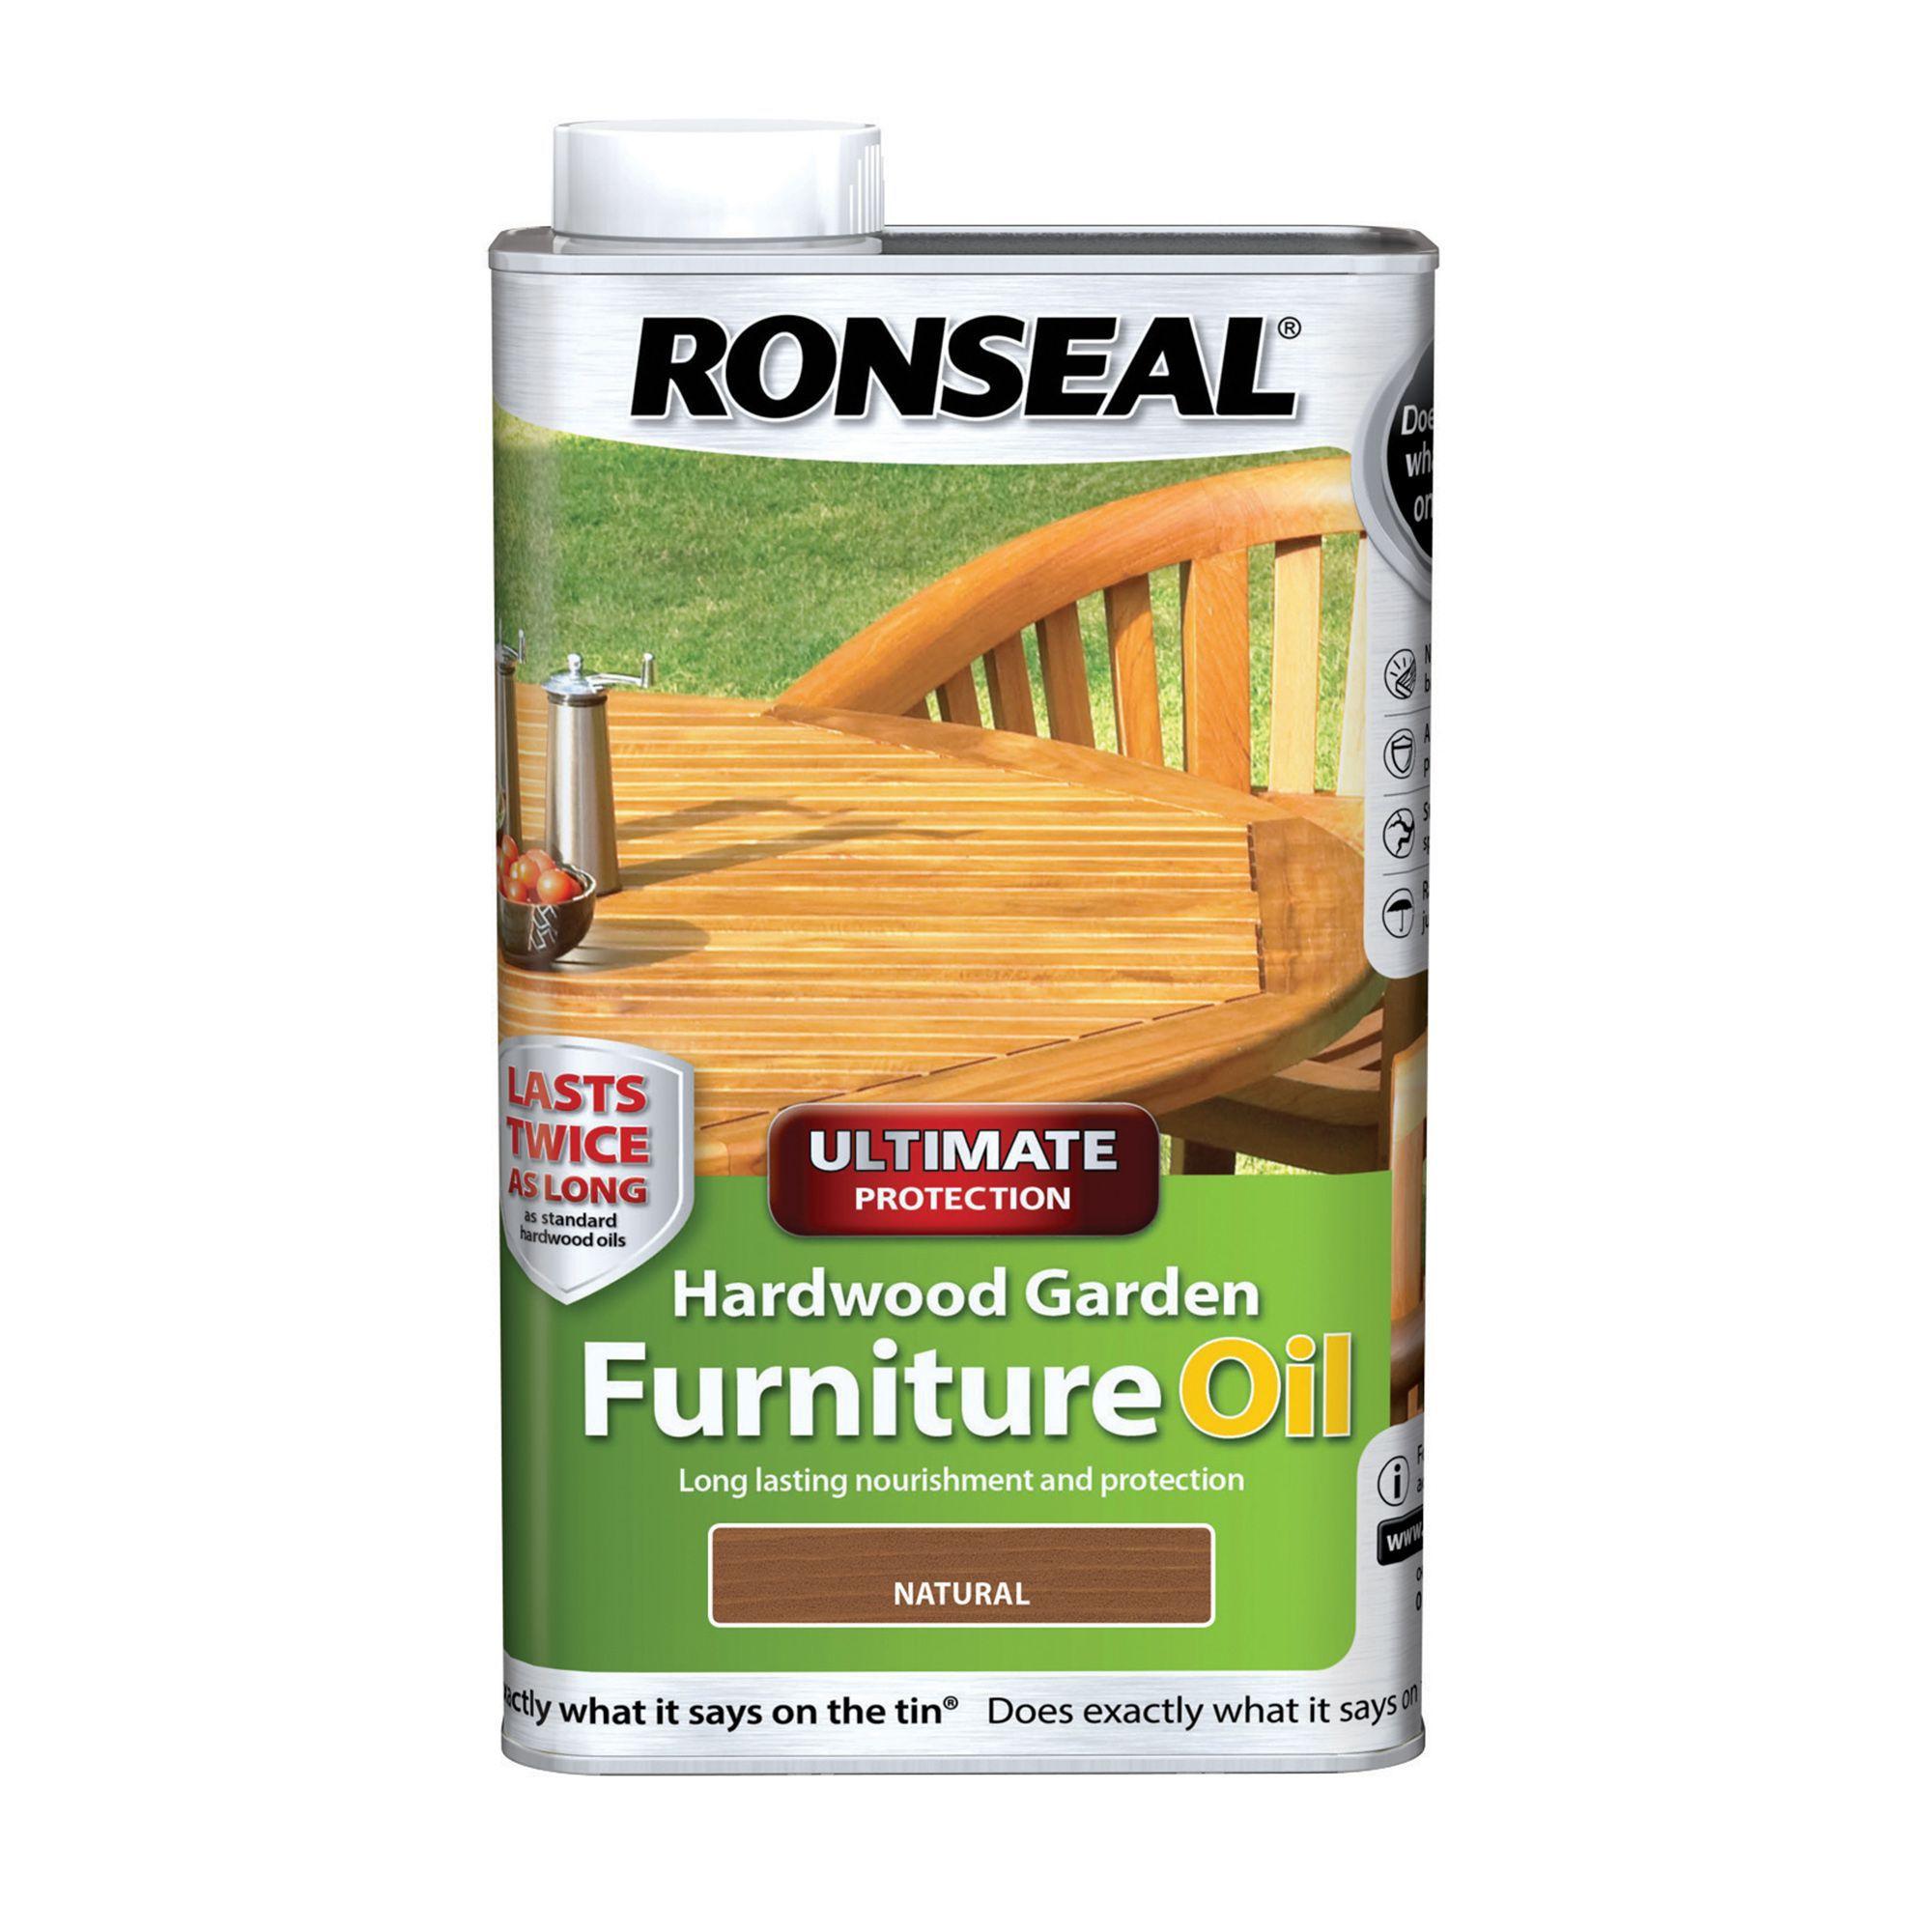 Ronseal Ultimate Natural Hardwood Garden Furniture Oil 1l